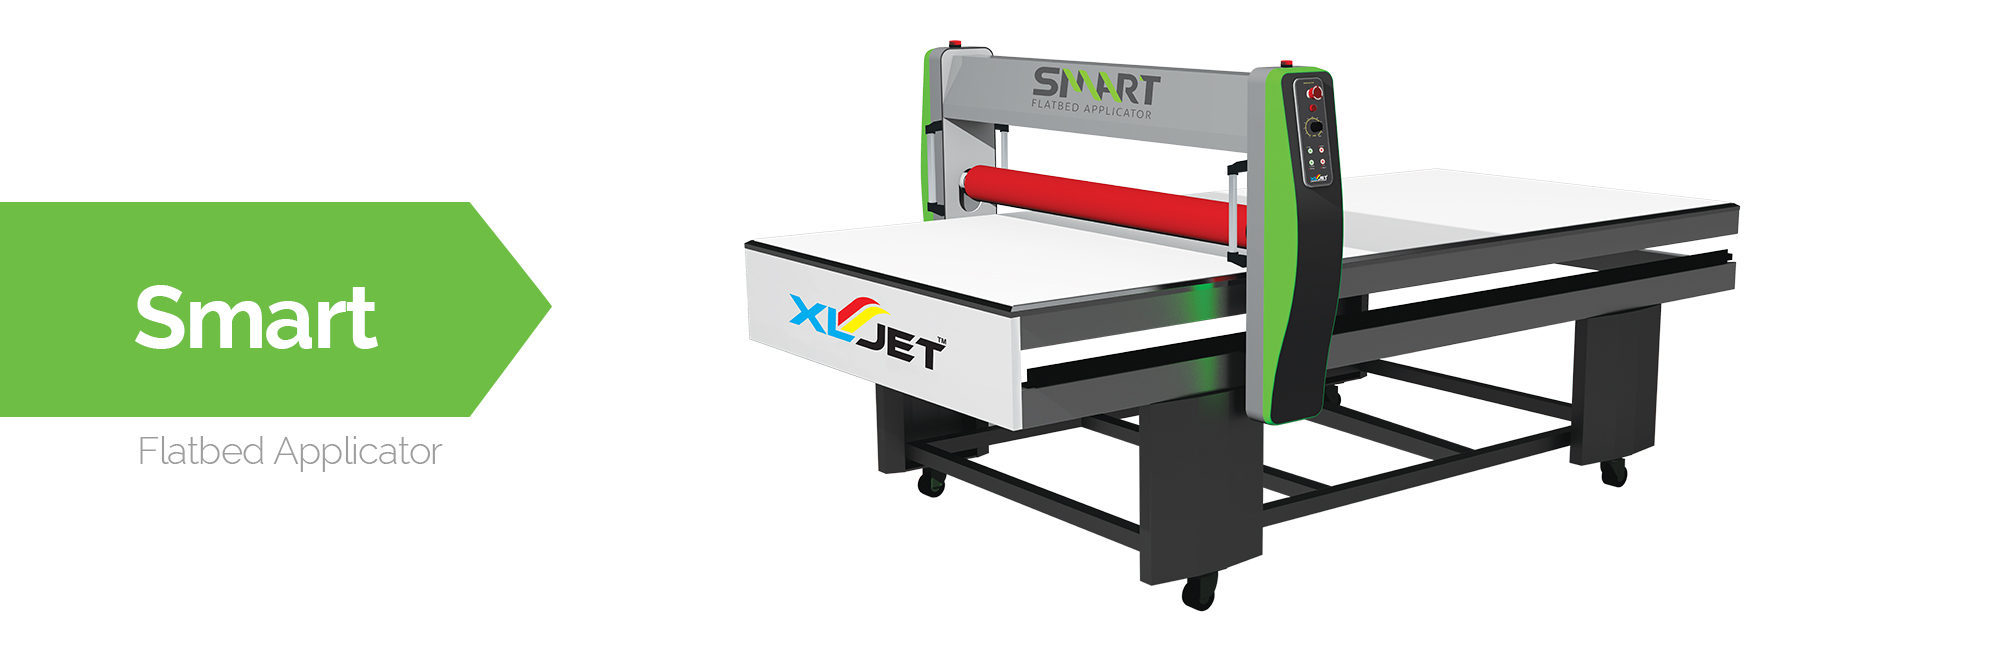 xljet lamination machine, b&r digitals, lamination machines